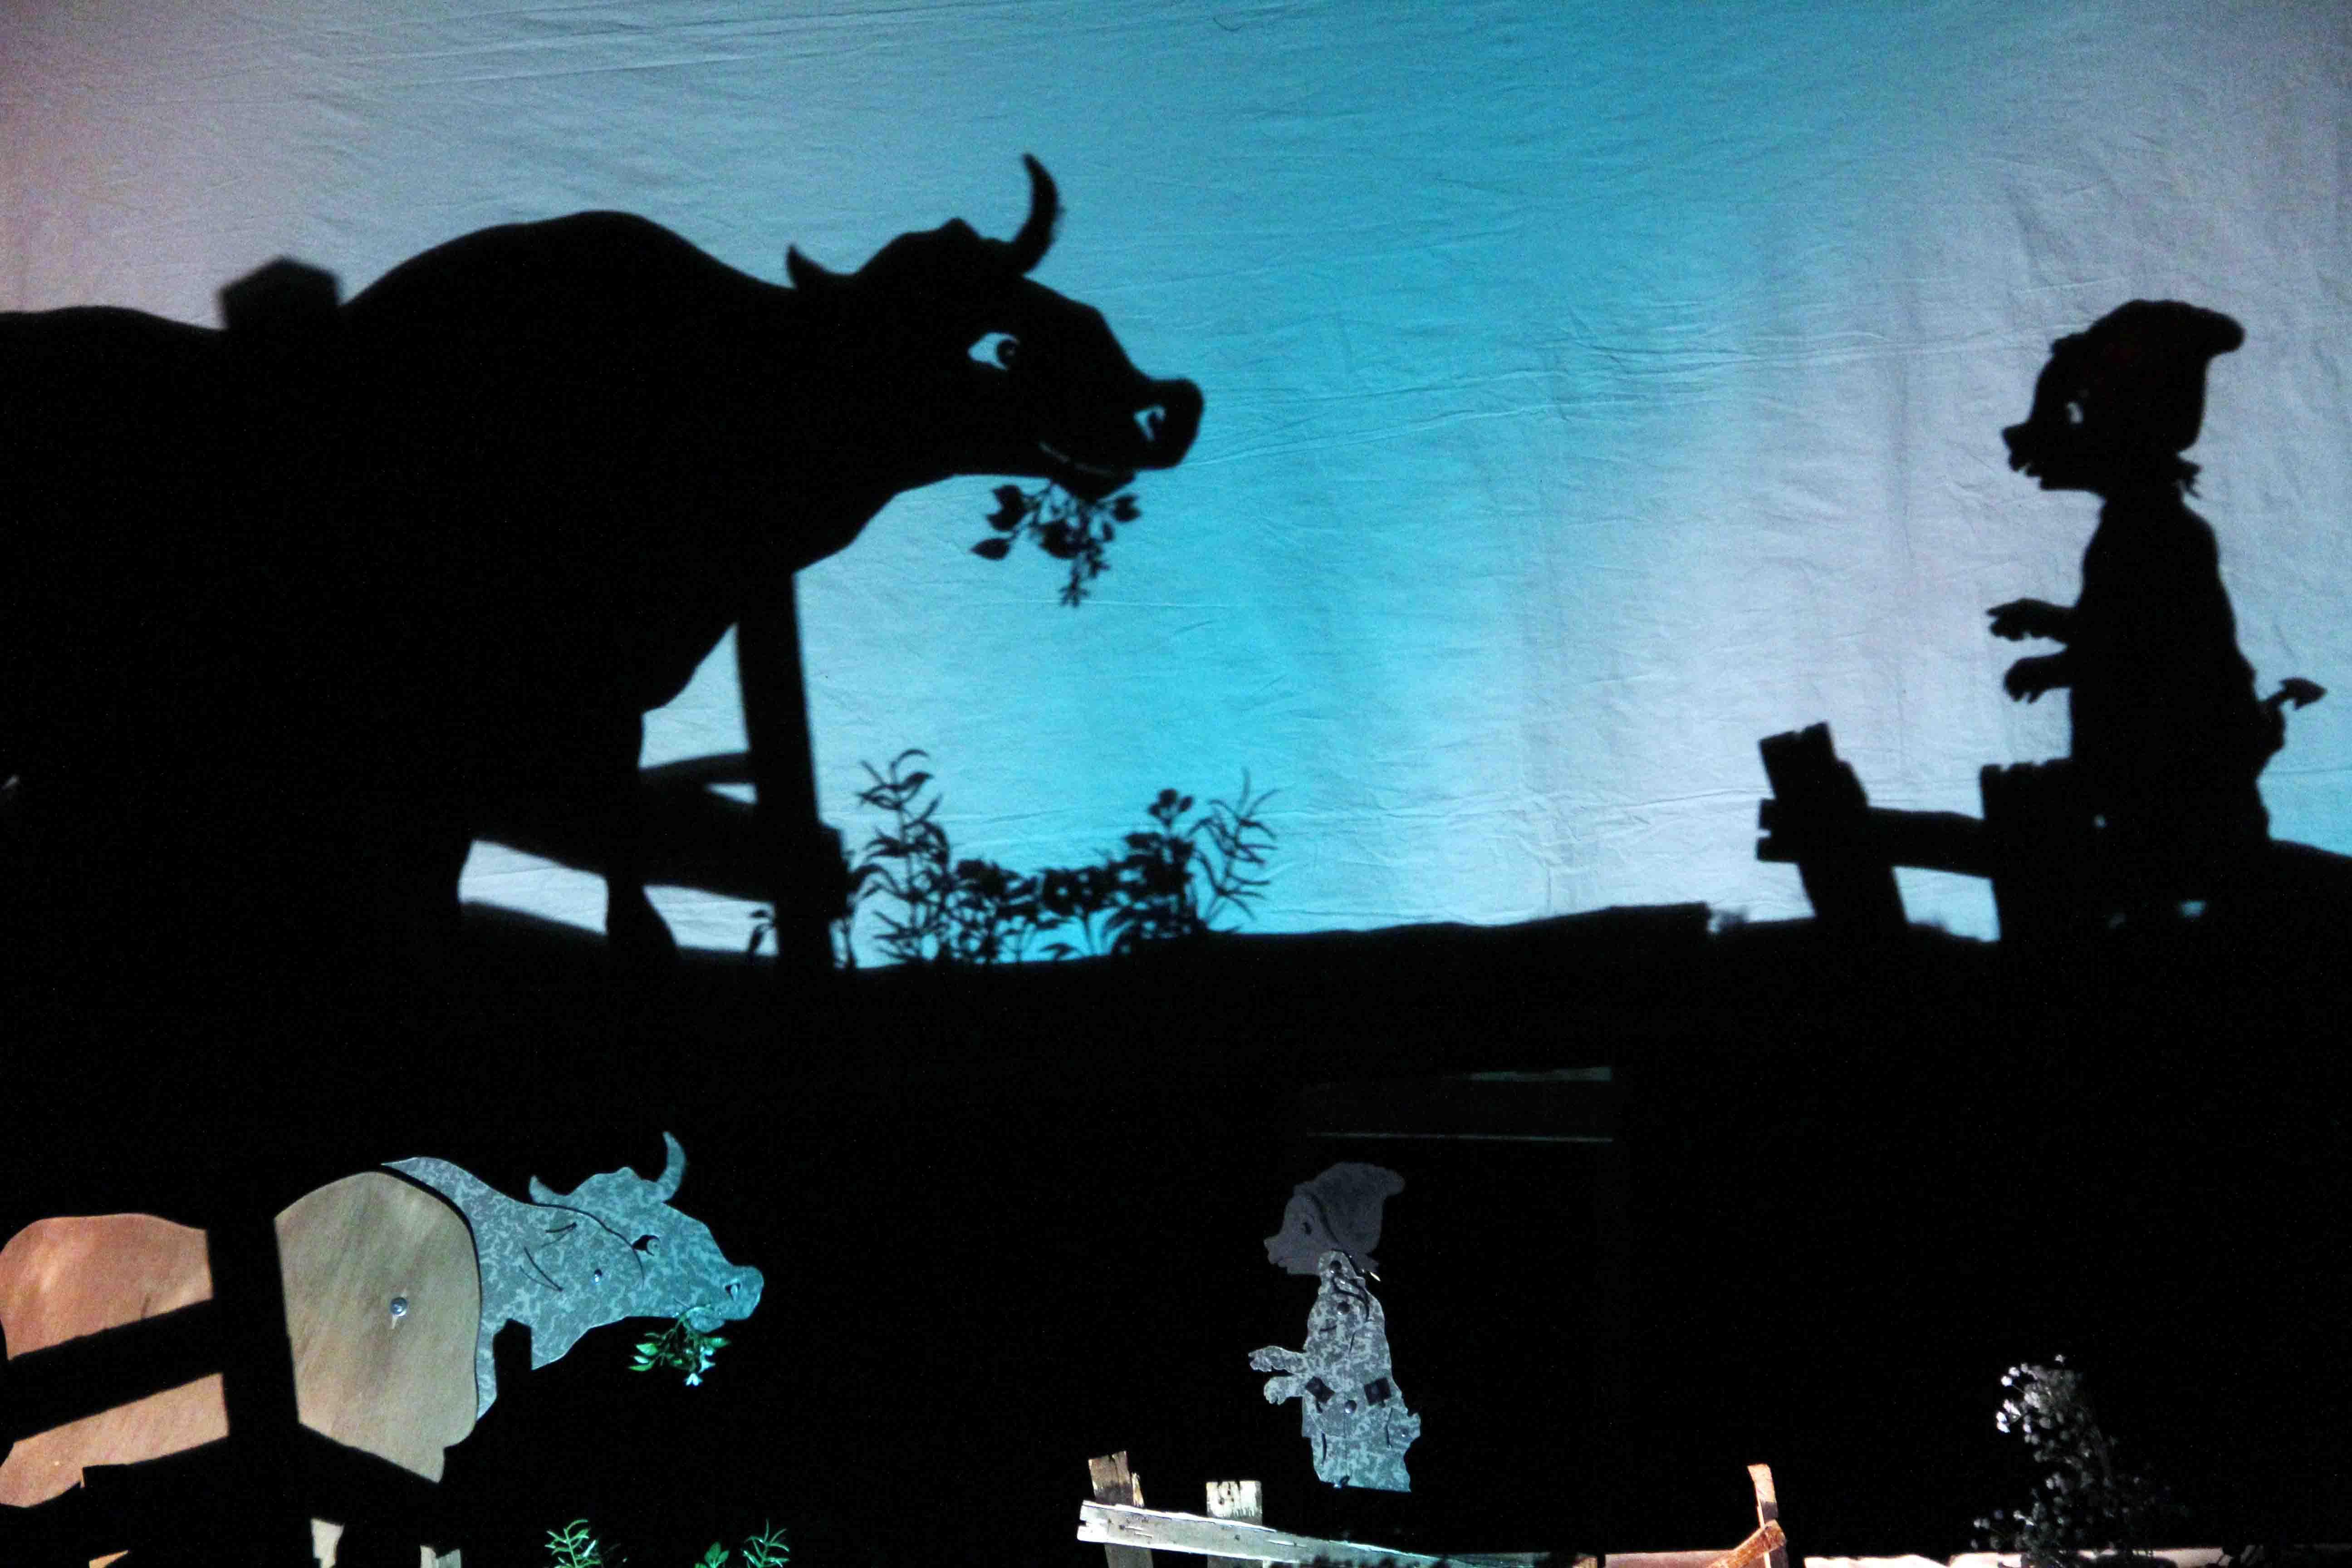 <em>Piccolo Asmodeo</em> (2012), une production de Teatro Gioco Vita (Piacenza, Italie), mise en scène : Fabrizio Montecchi. Photo: Prospero Cravedi